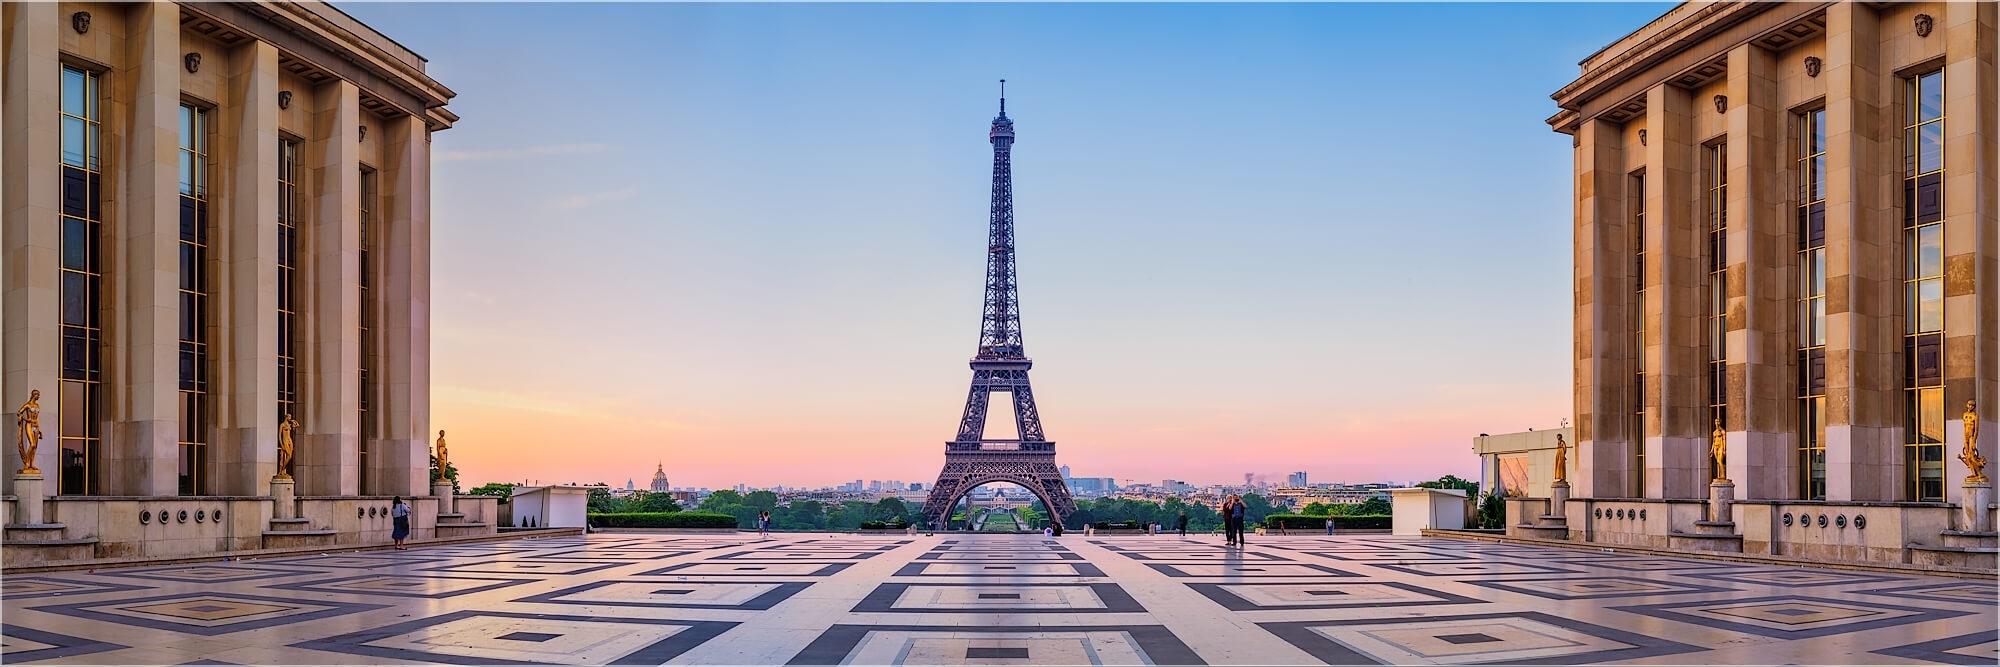 Bilder aus Paris als Wandbild oder Küchenrückwand